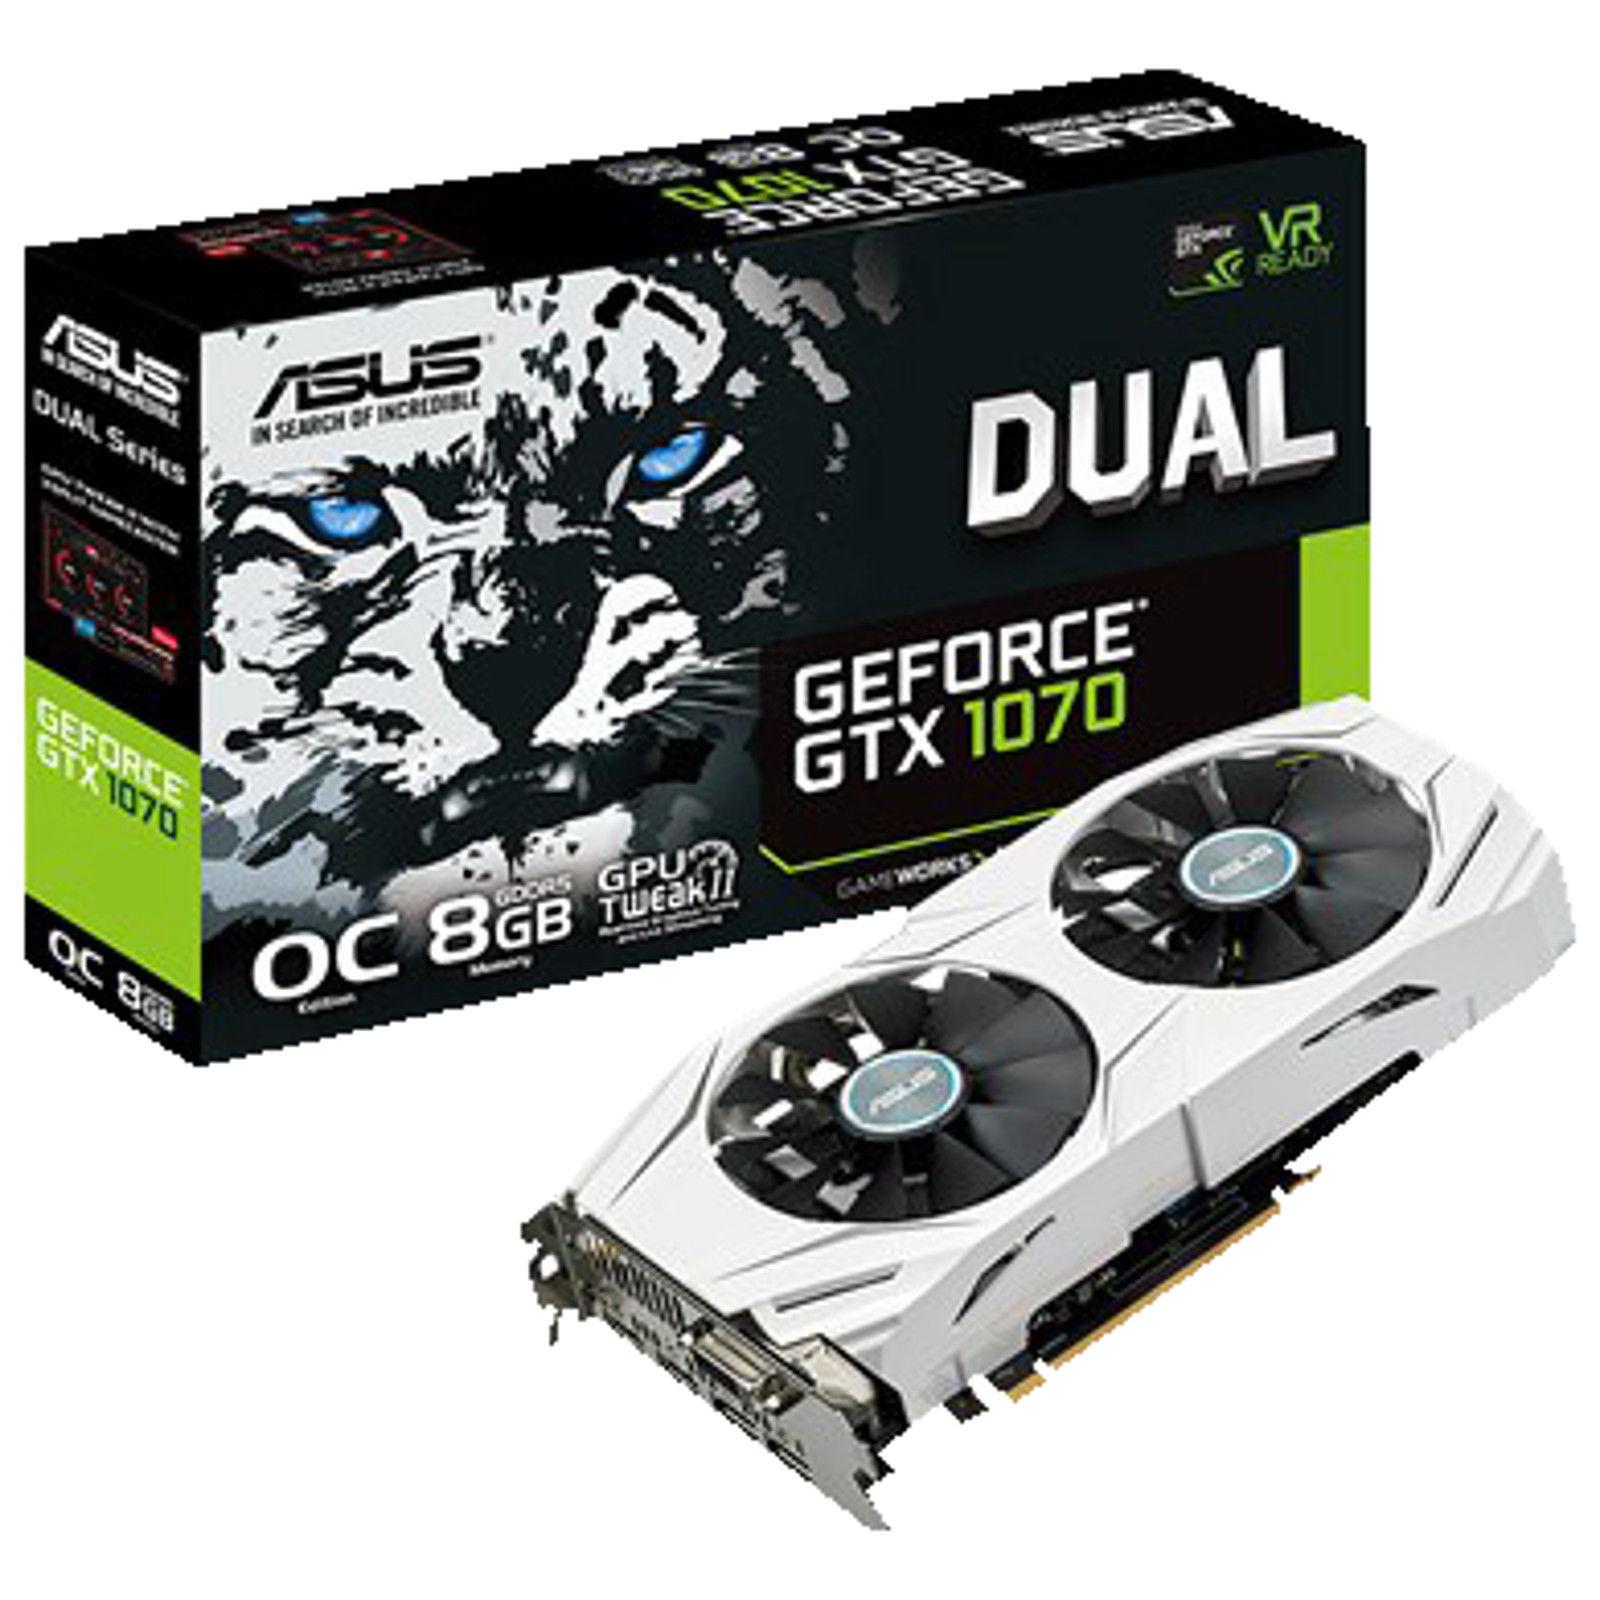 Asus GeForce GTX 1070 OC Dual 8GB für 368,10€ (eBay)